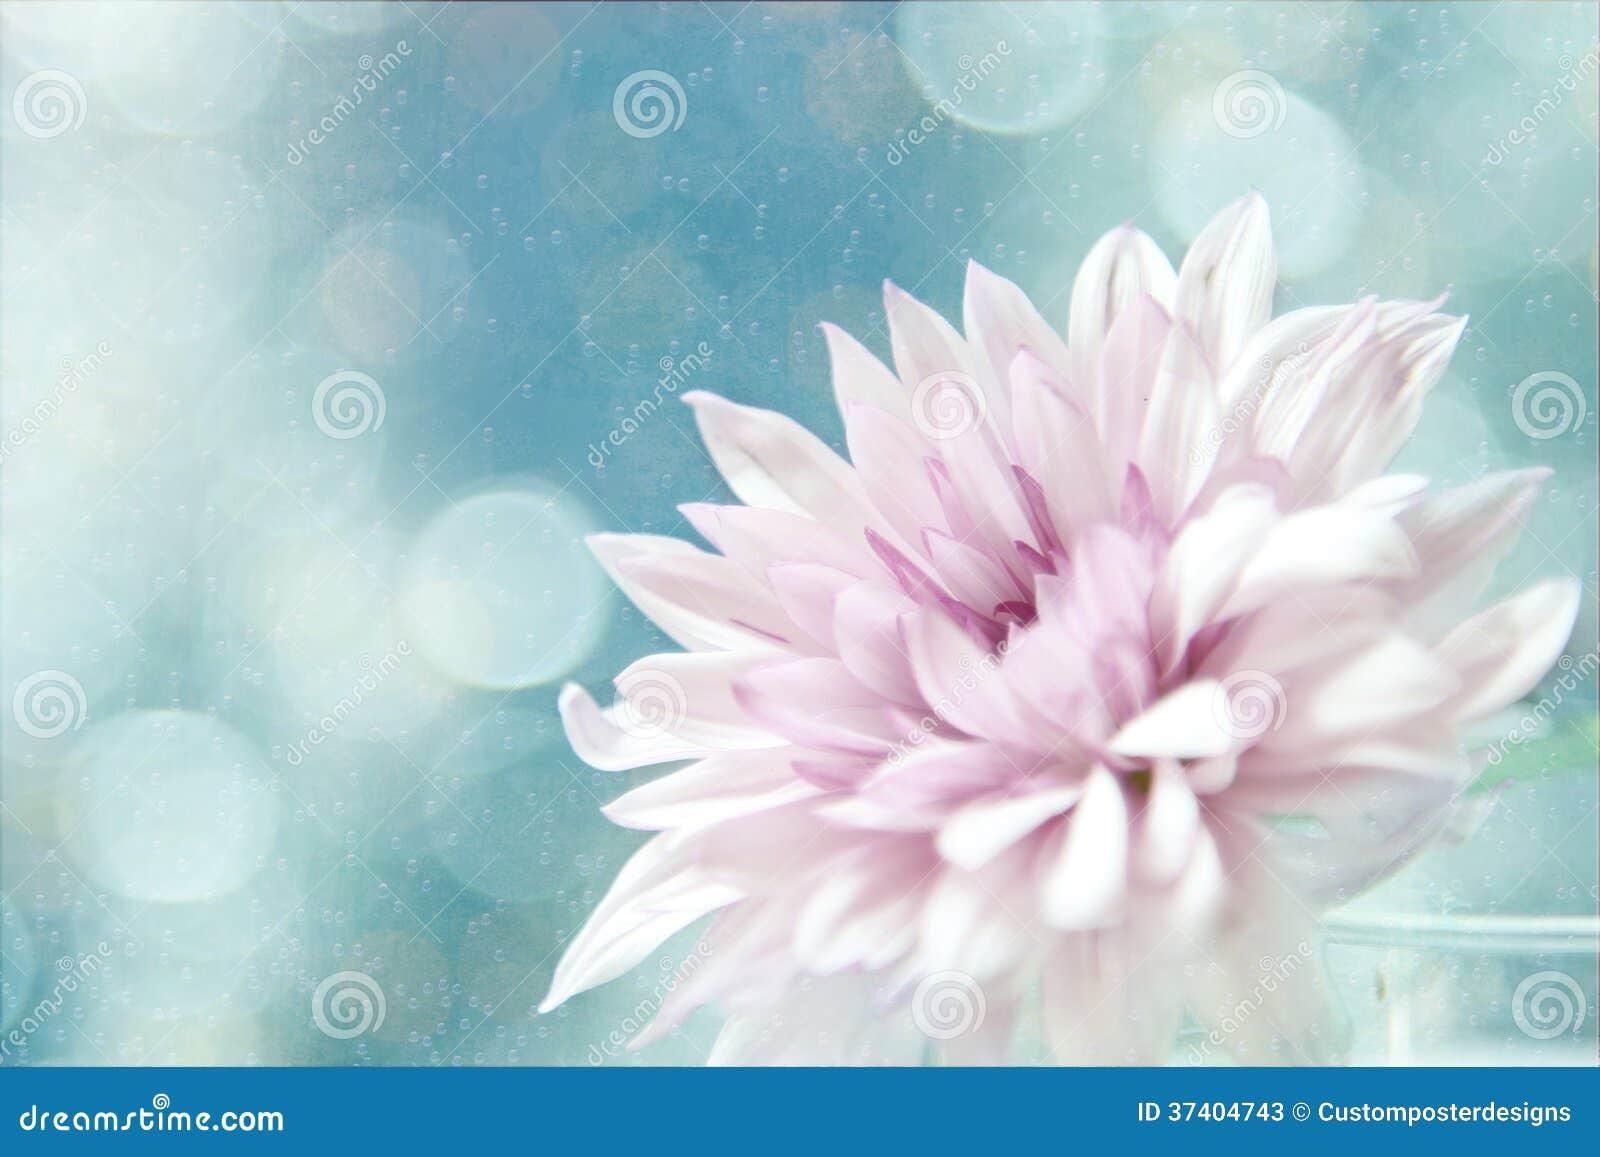 A beautiful soft pink flower.